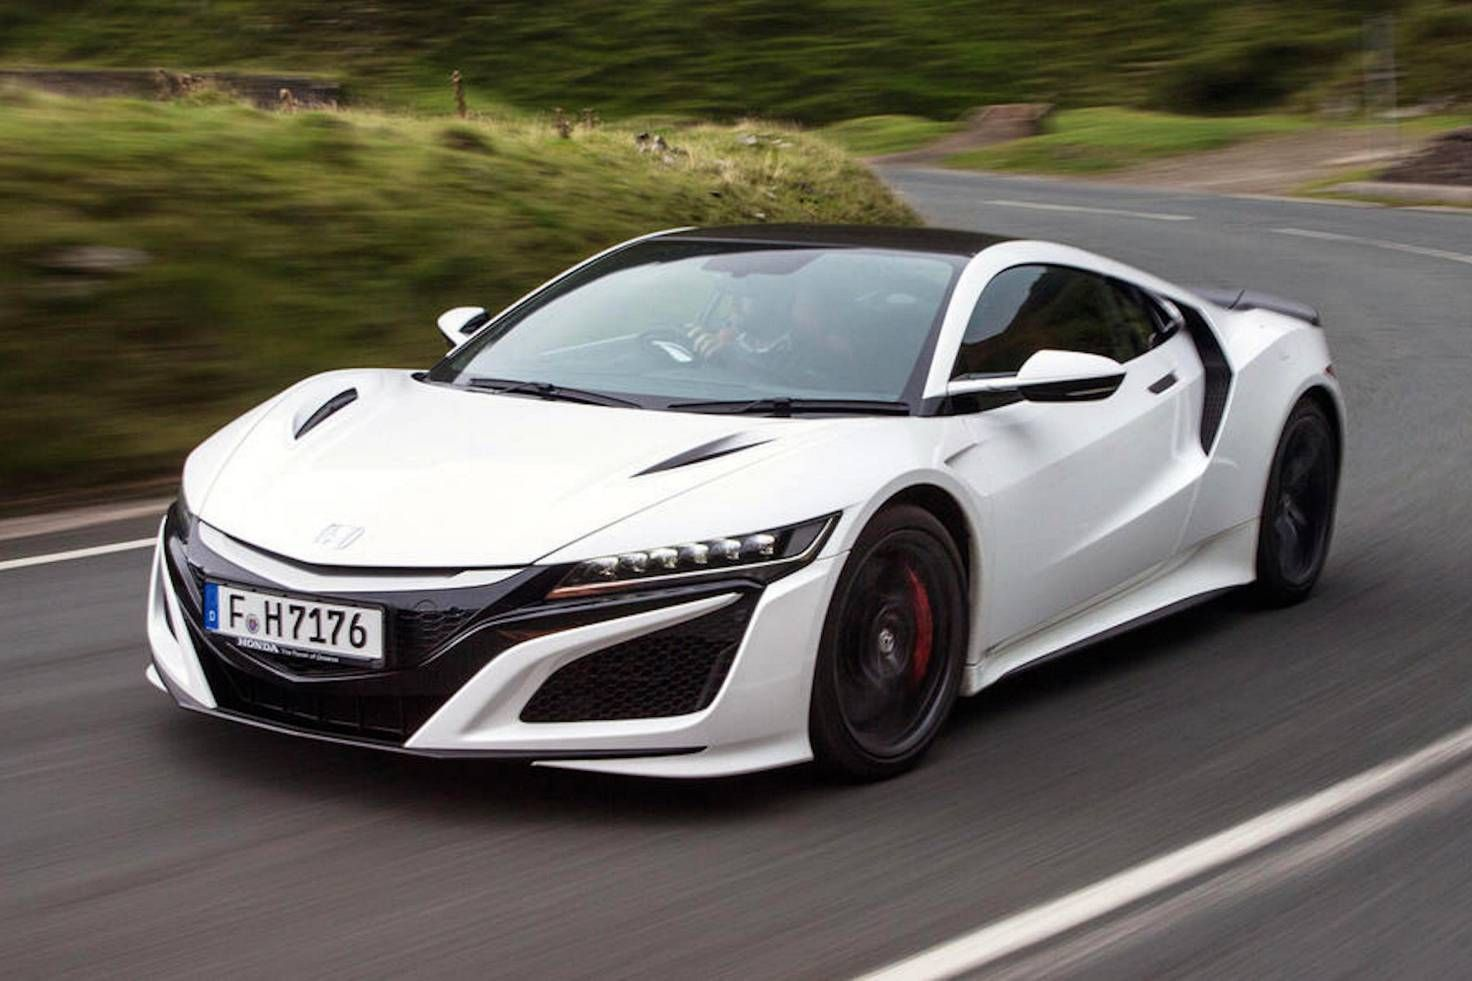 2017 honda nsx review what car  [ 1472 x 981 Pixel ]